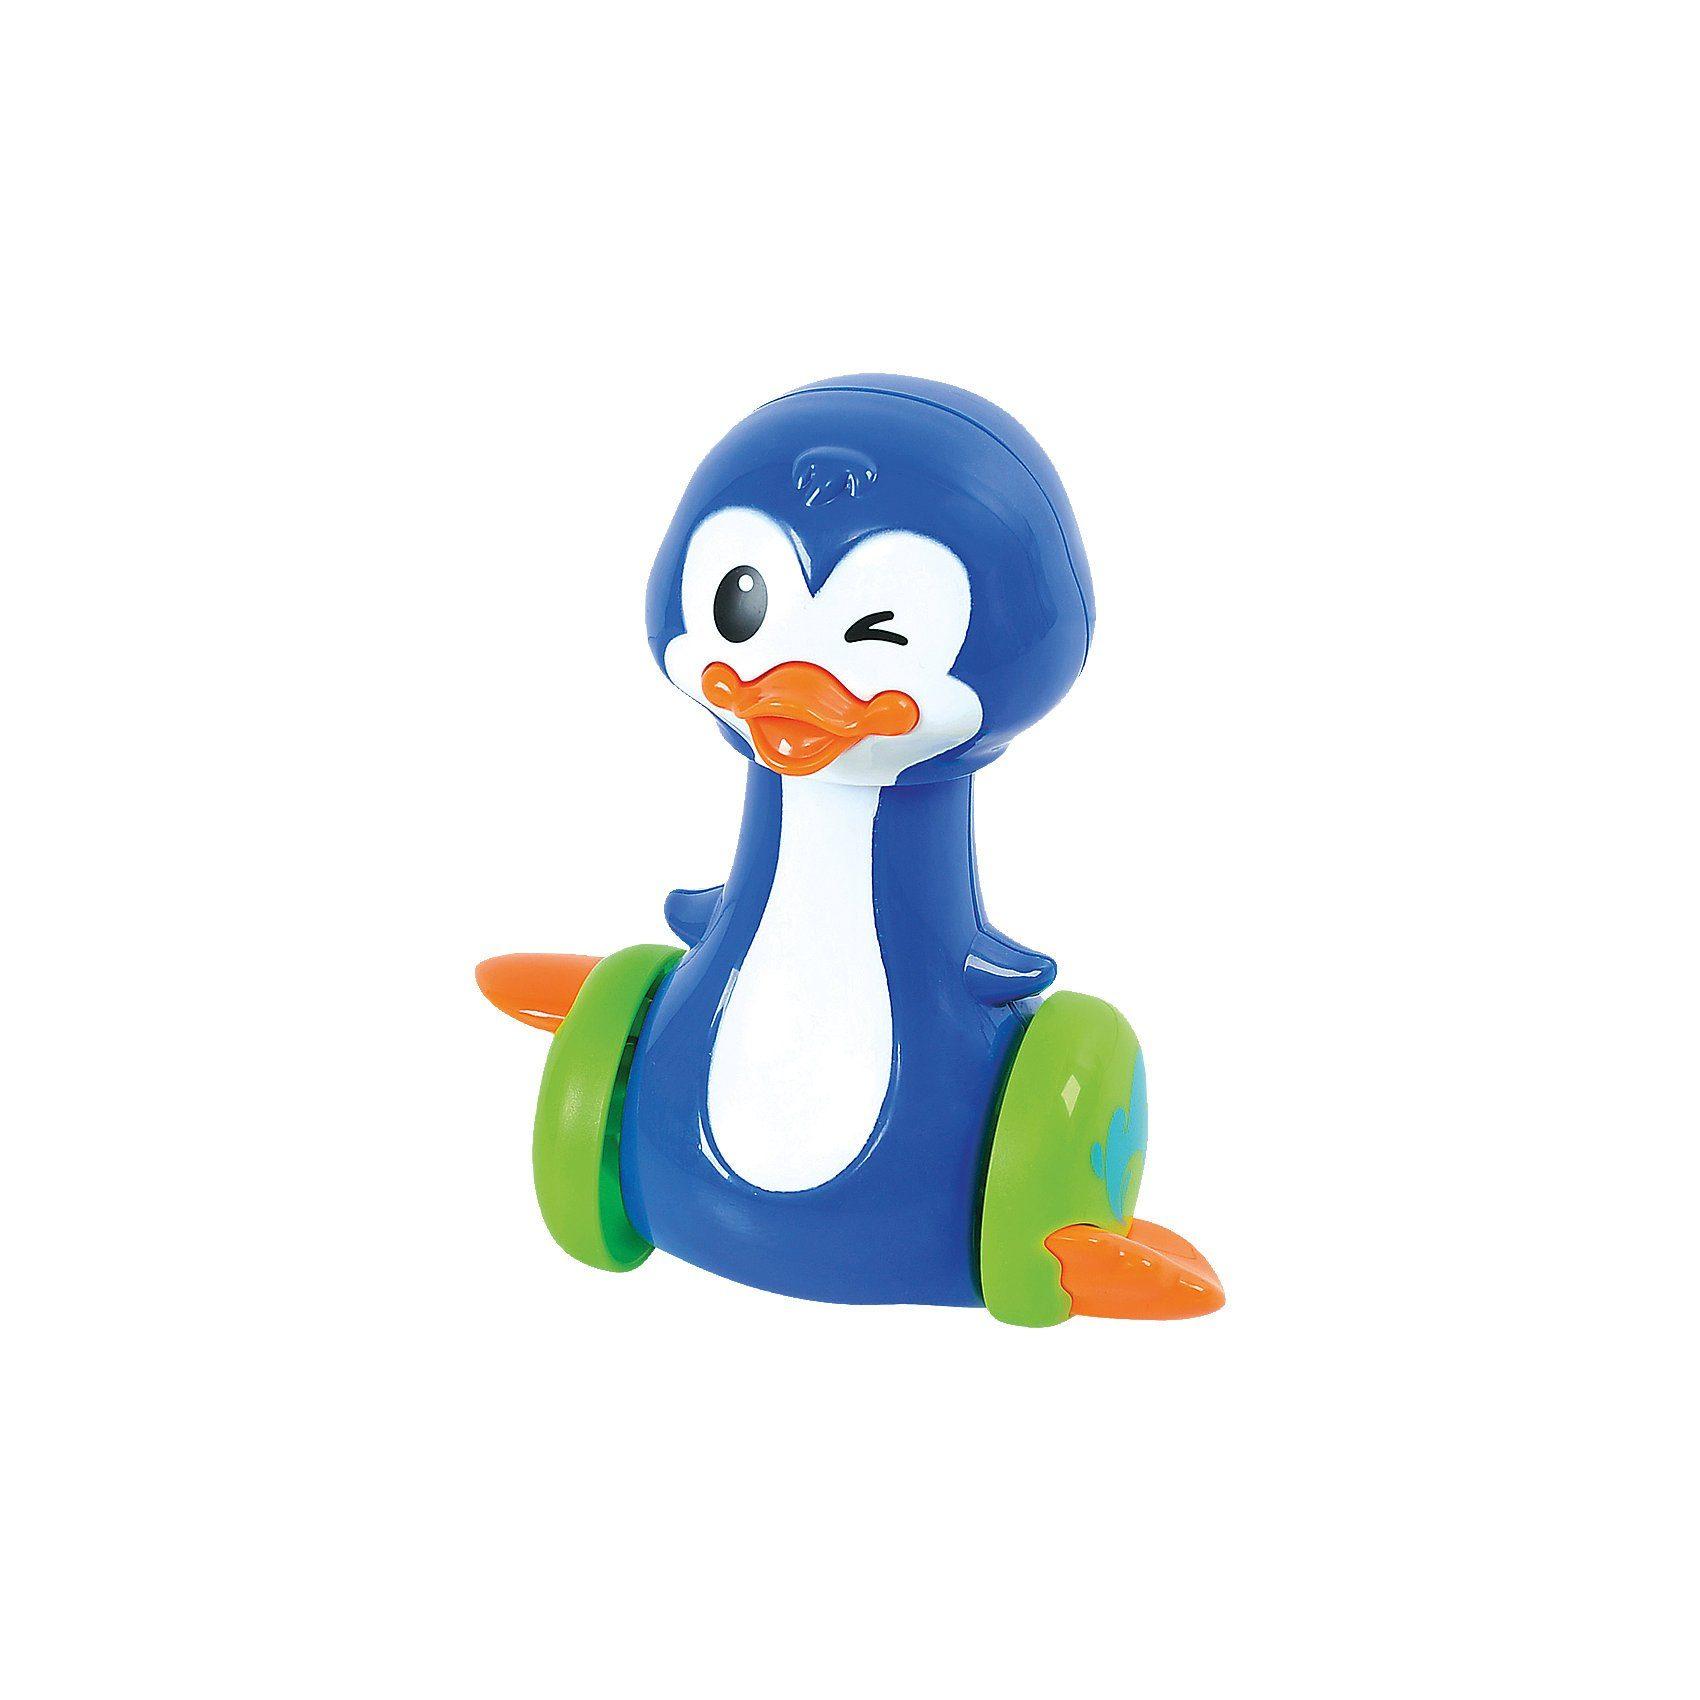 Playgo Push & Go Pinguin